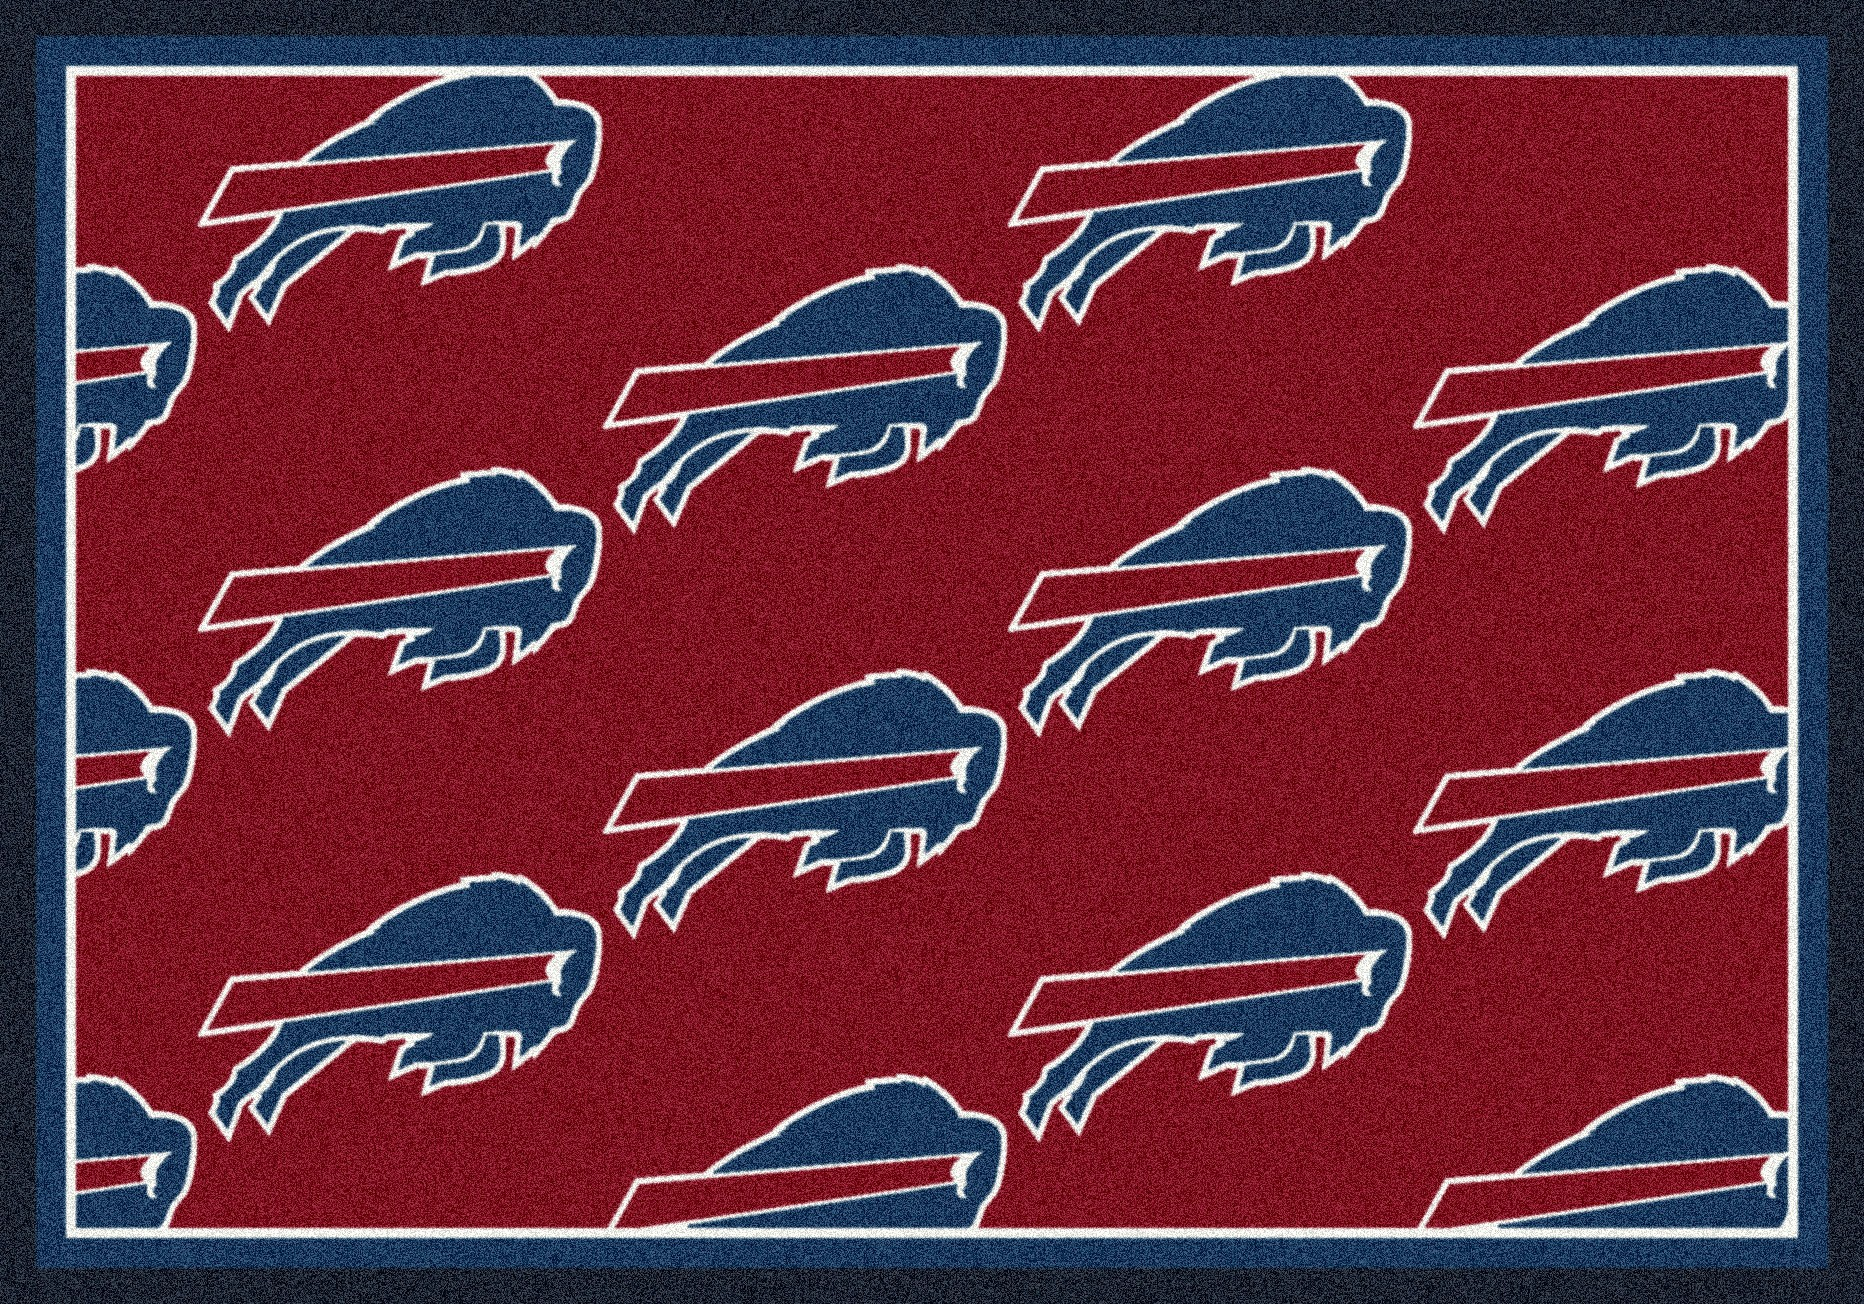 Buffalo Bills Iphone Wallpaper Buffalo bills nfl football yc 1864x1304